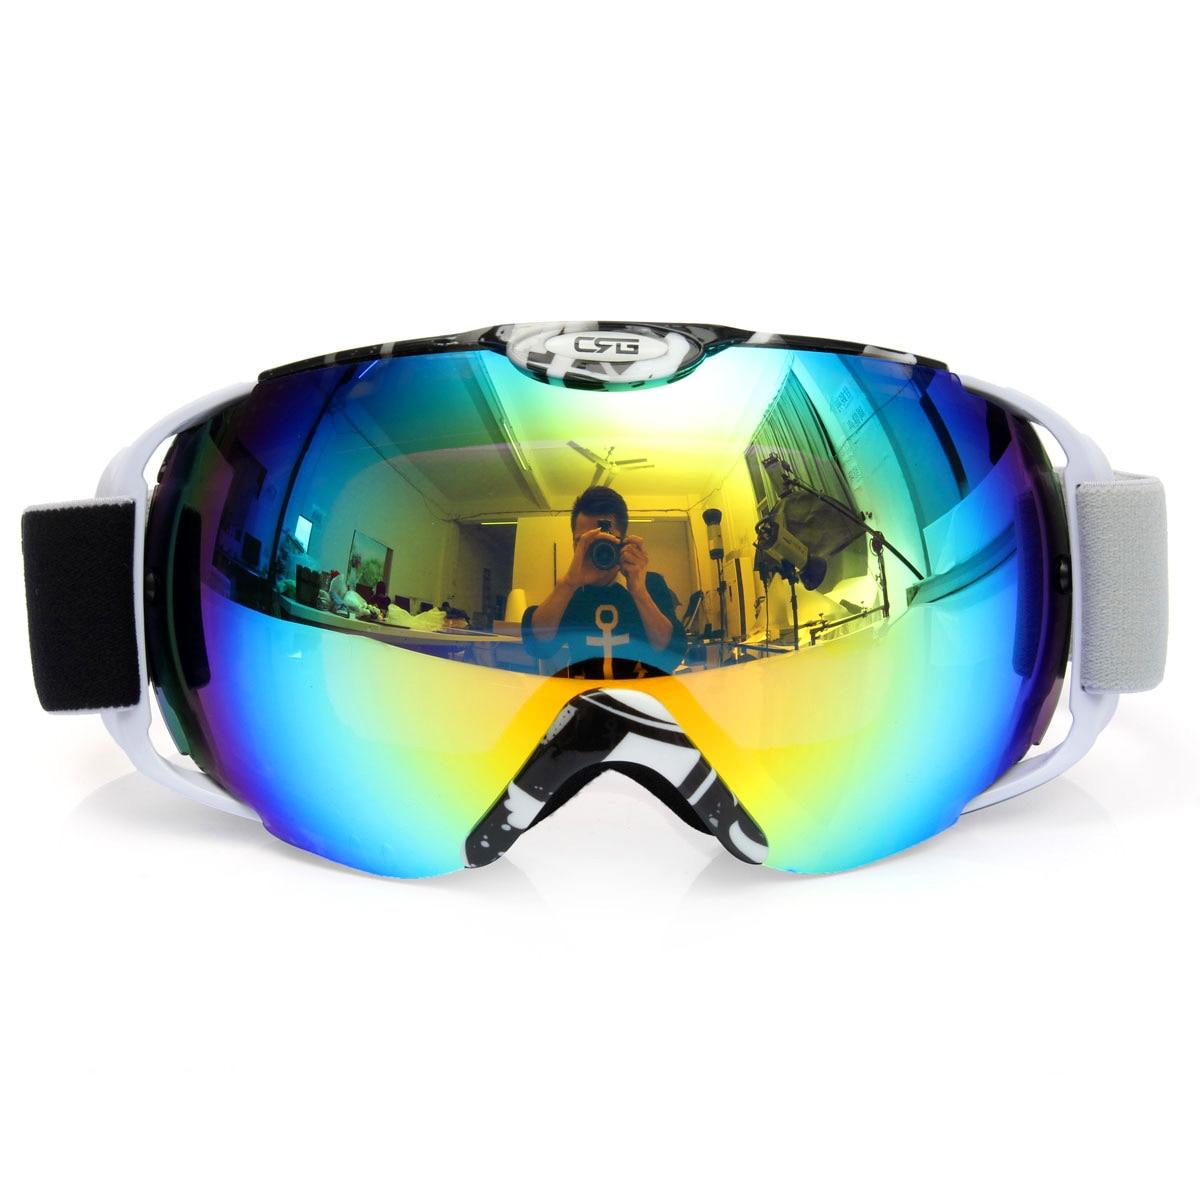 Unisex Adults Professional Spherical Anti-fog Dual Lens Snowboard Ski Goggle Eyewear newest adults